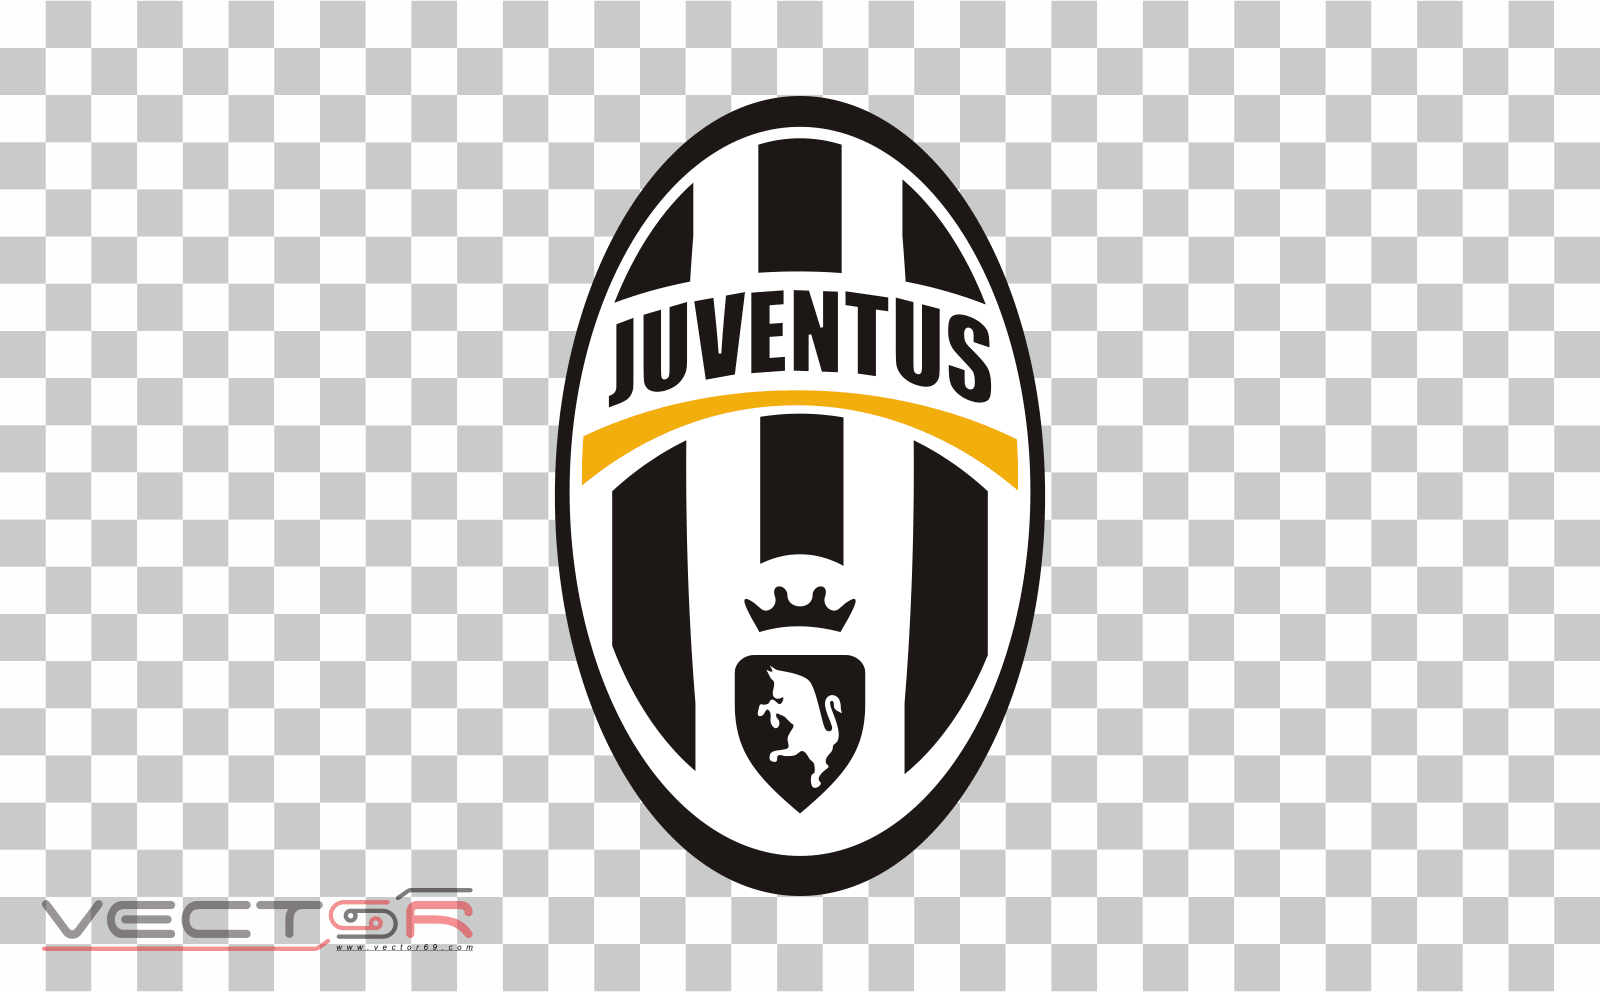 Juventus F.C. (2004) Logo - Download .PNG (Portable Network Graphics) Transparent Images